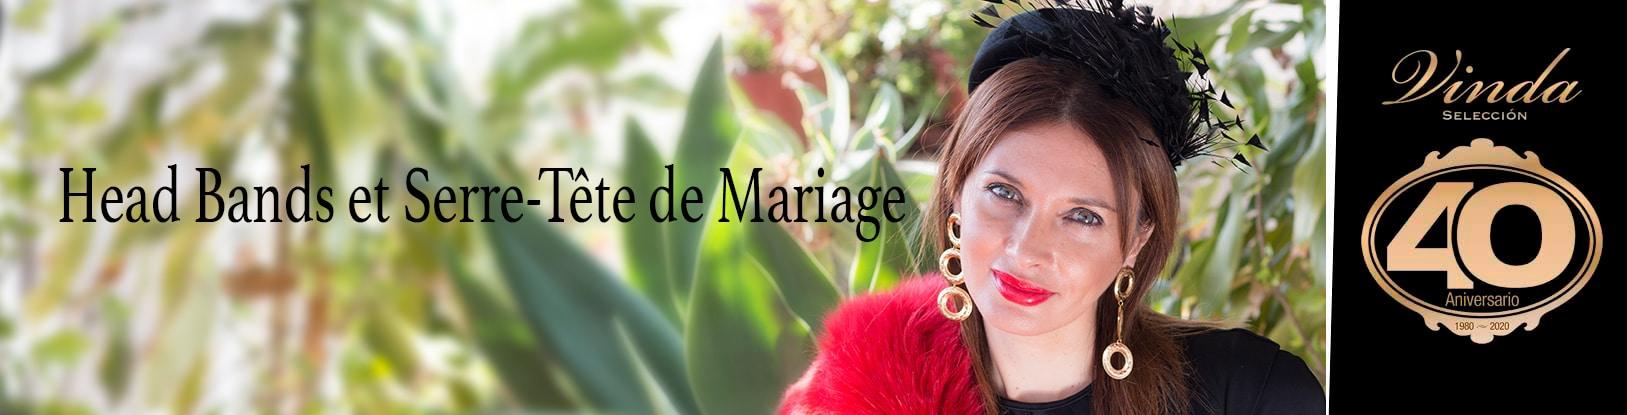 Headbans et serre-tête de mariage